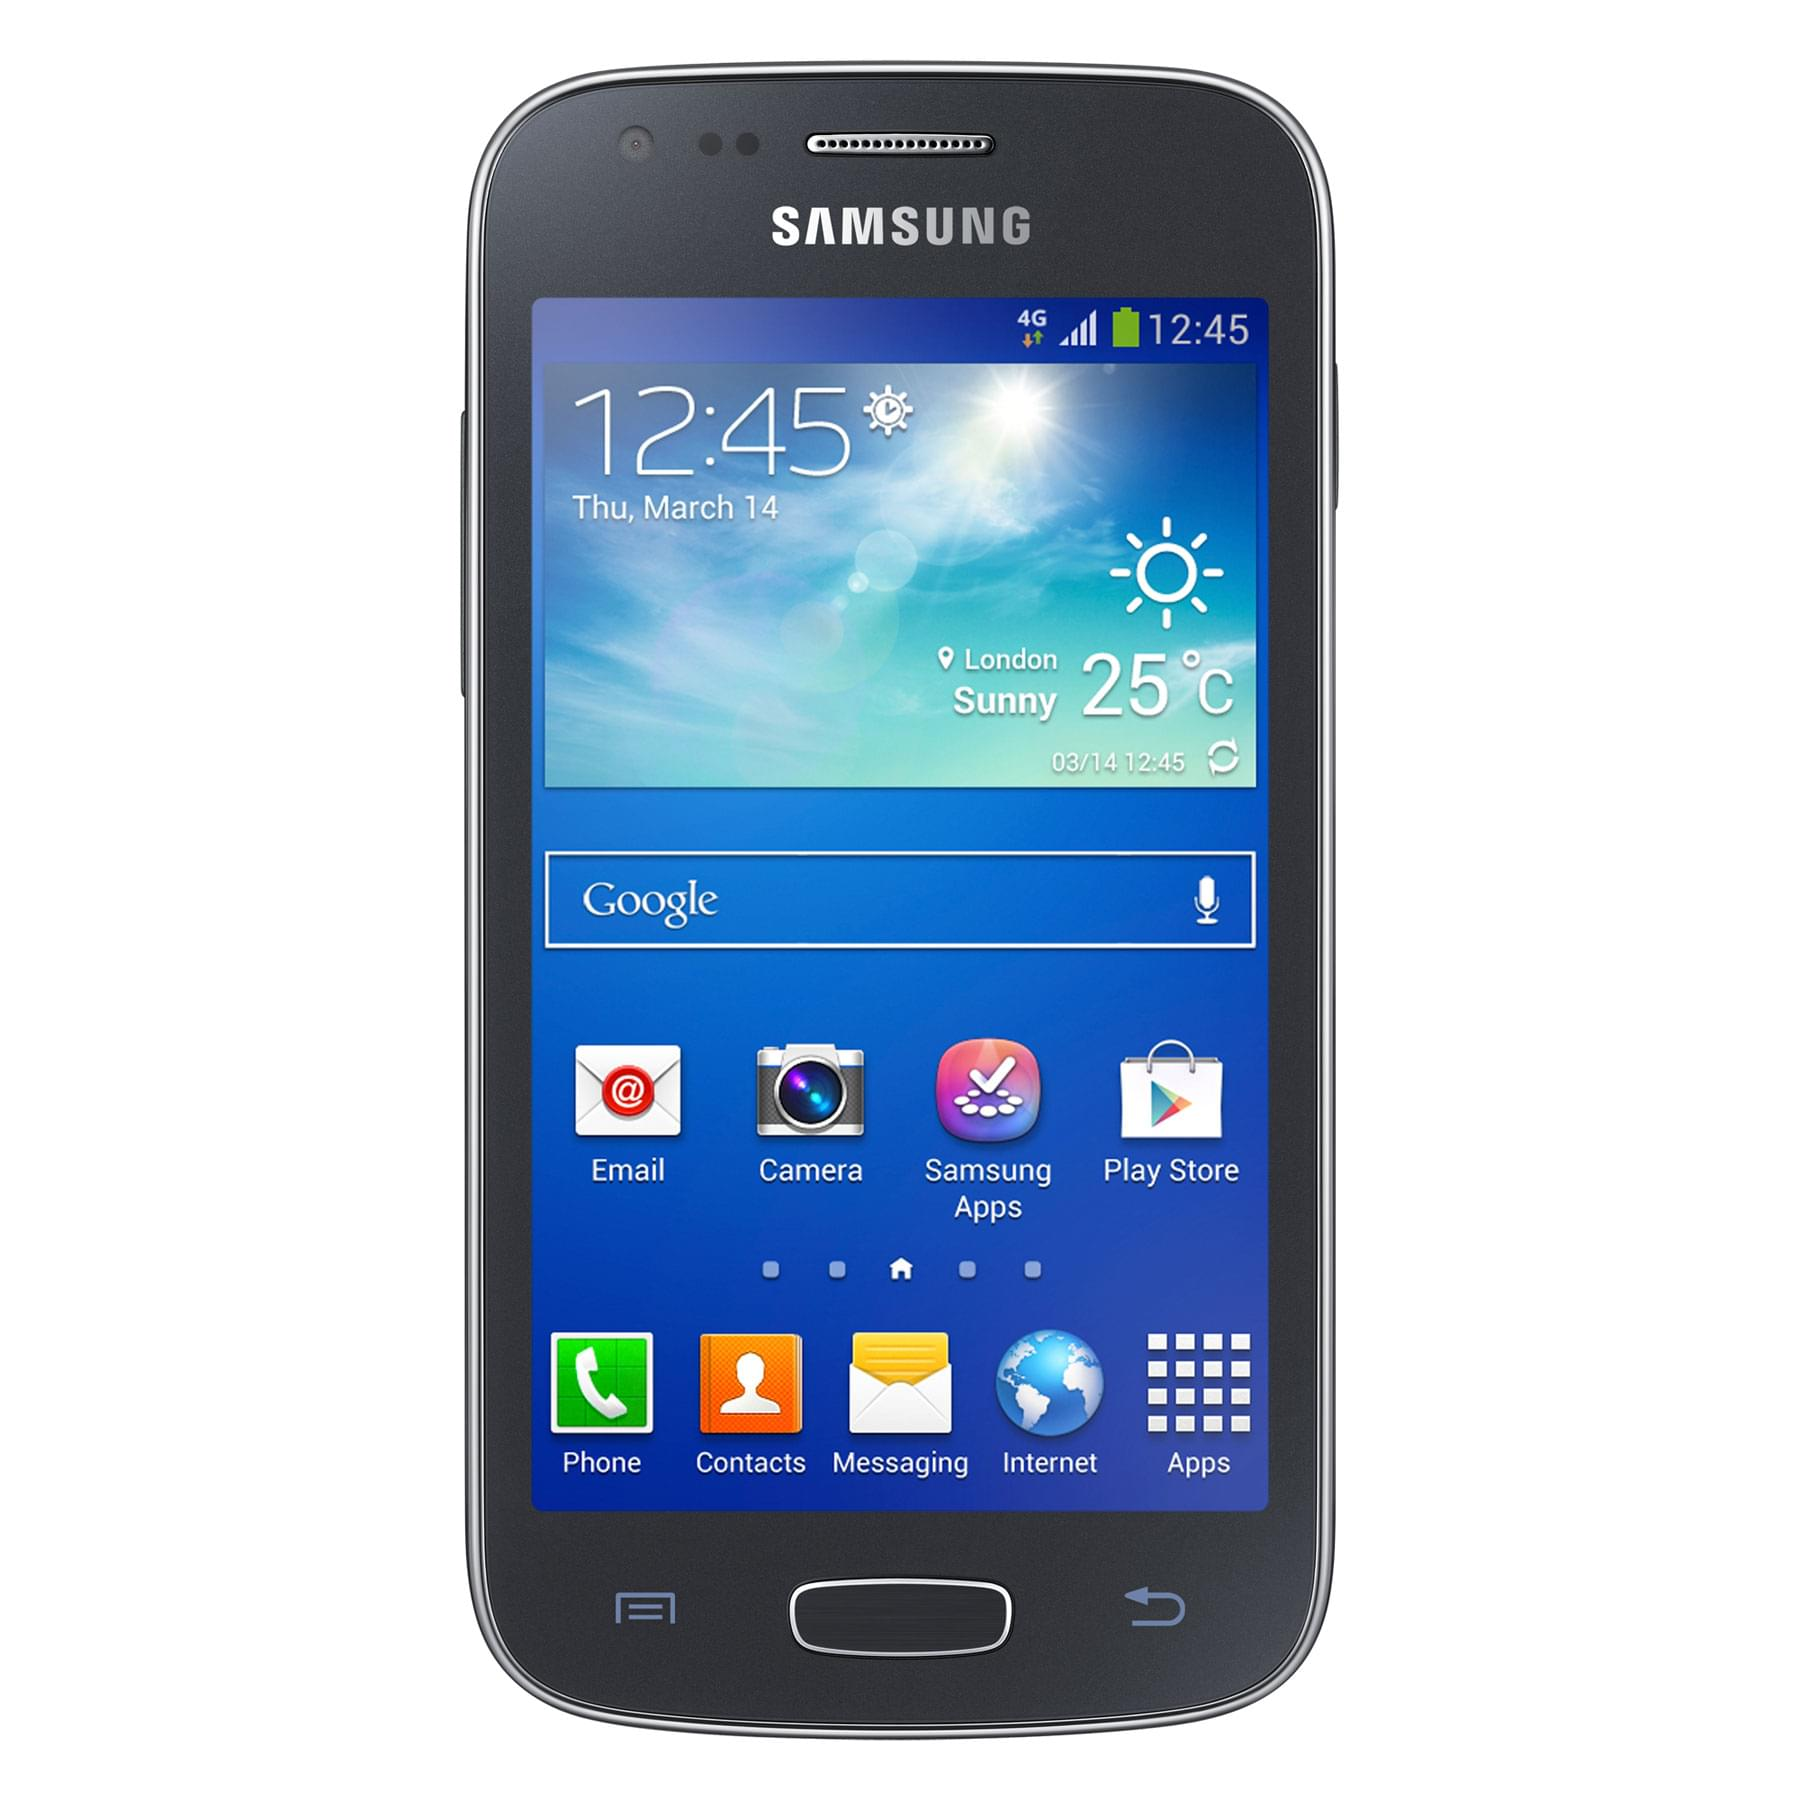 Samsung Galaxy Ace 3 8Go Noir S7275 (GT-S7275HKNXEF) - Achat / Vente Téléphonie sur Cybertek.fr - 0